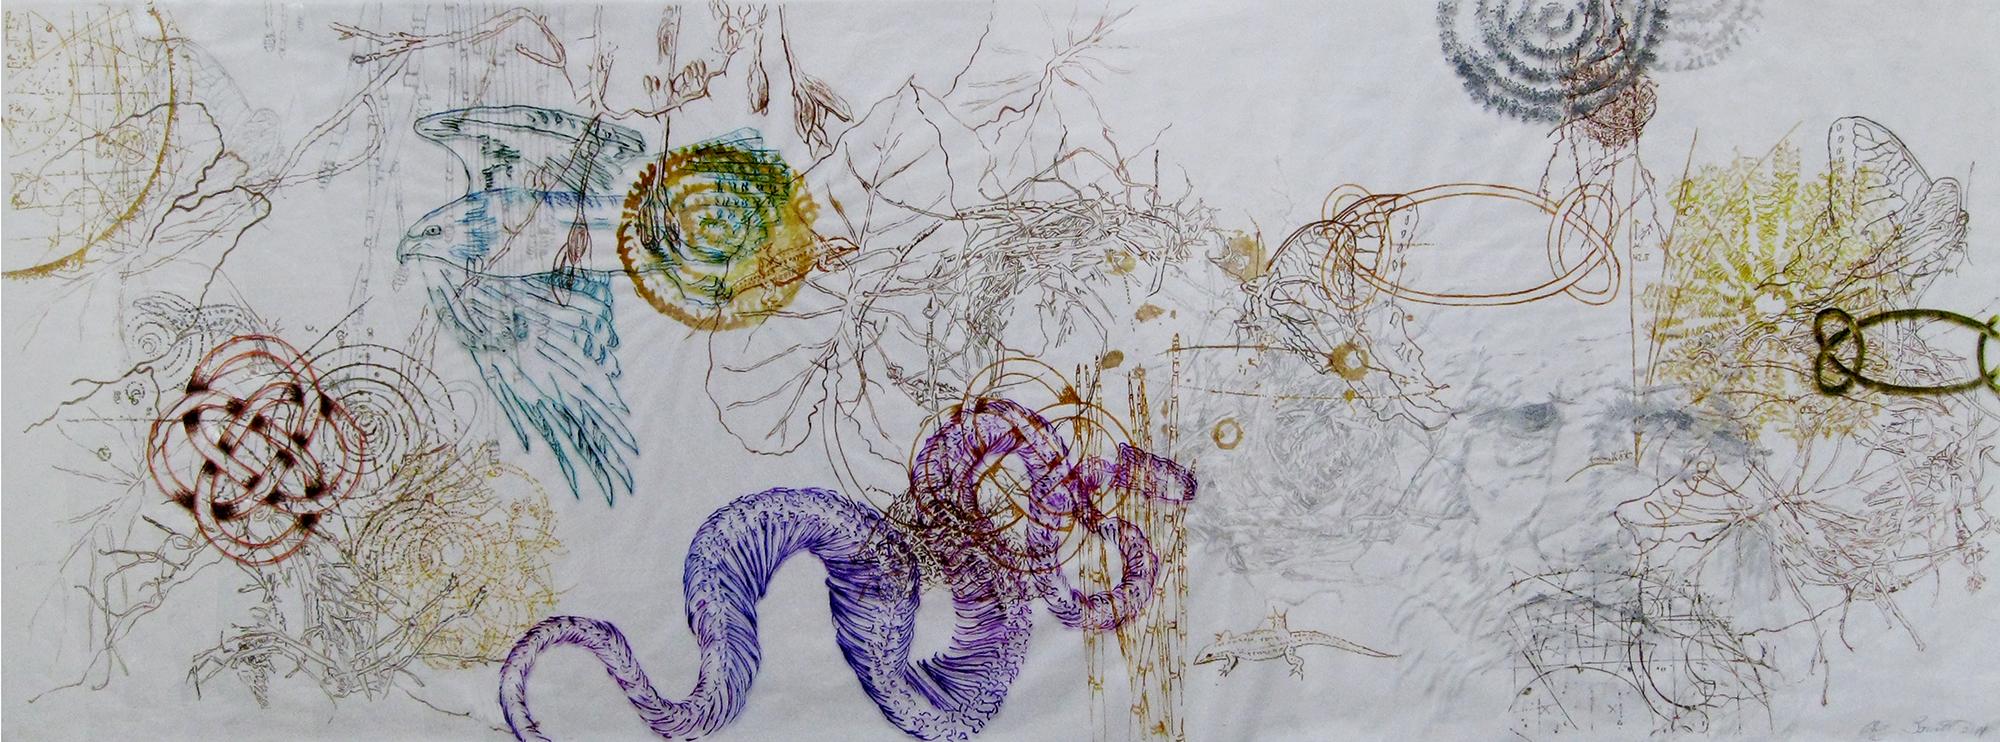 Leonardo's Dream, 2014, Acrylic Ink on Paper and Plexiglas, 18 x 48